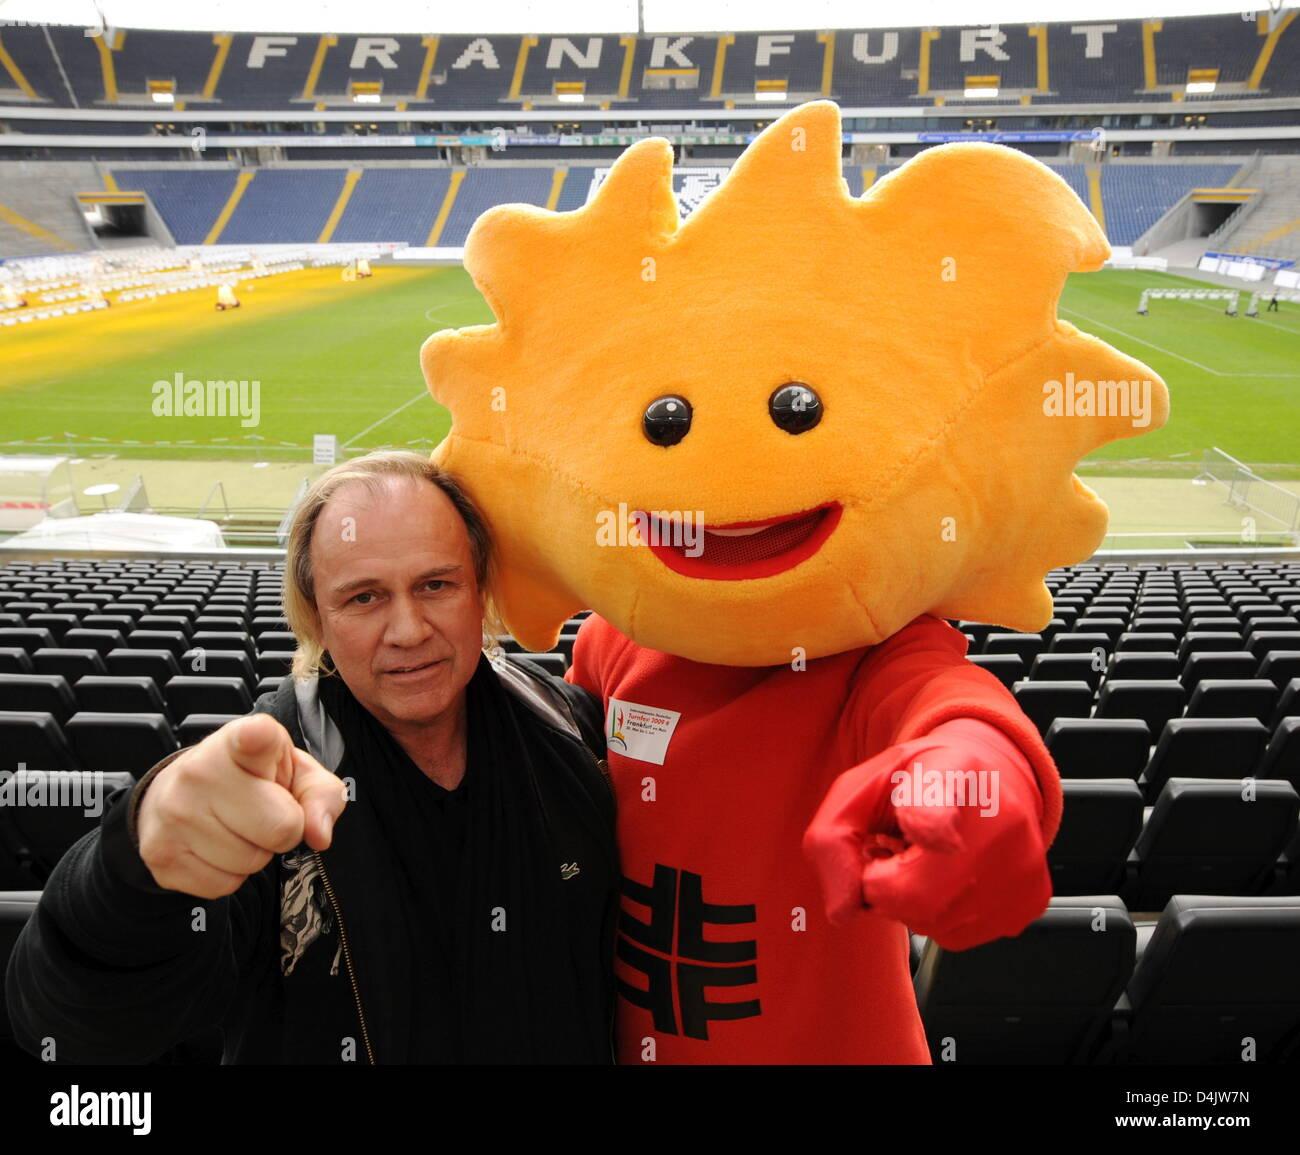 ?Struwwel? (R), the mascot of the International German Gymnastics Festival 2009, and Enno-Ilka Uhde, performance - Stock Image